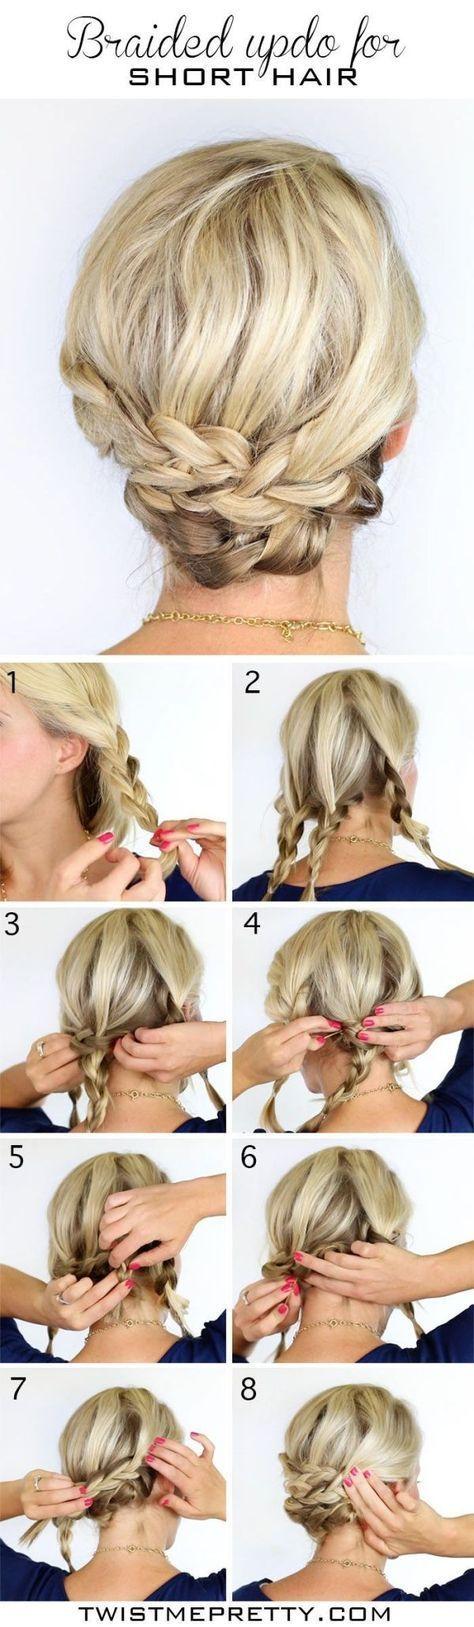 Braided Updo Hairstyle For Short Hair By Angie Hartips Hverdagshar Frisyrer